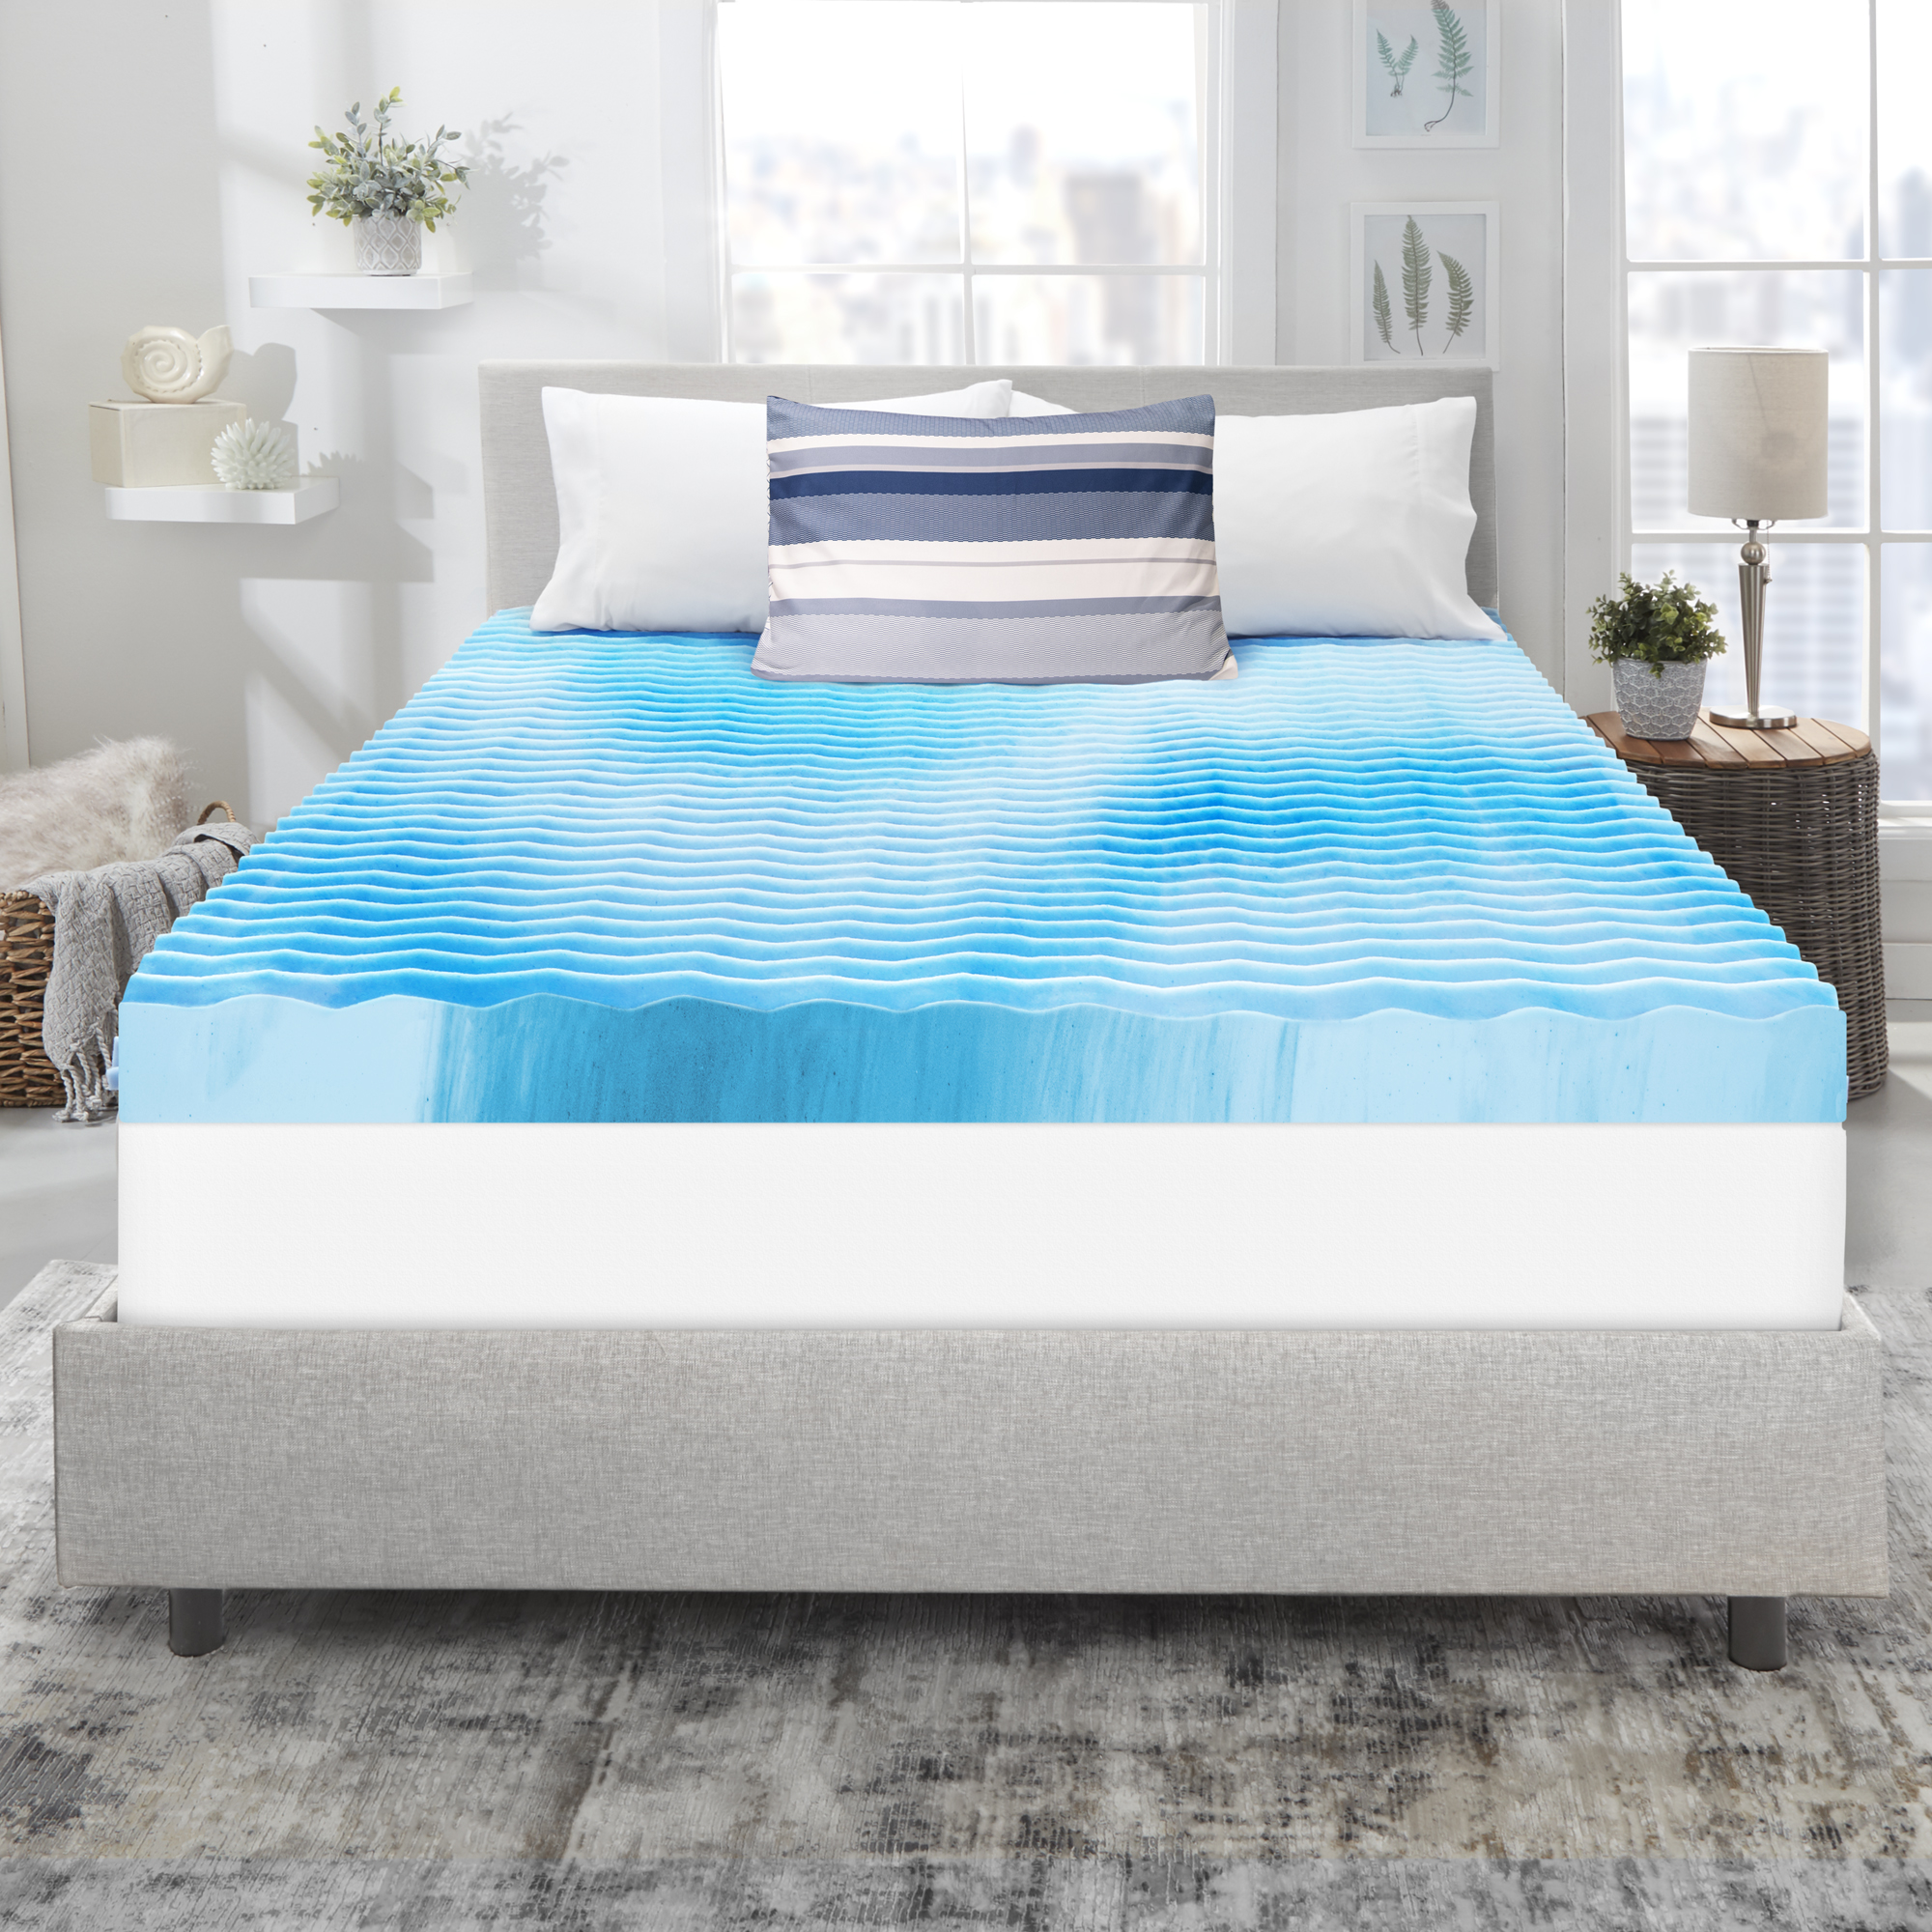 homedics 4 wave support memory foam antimicrobial mattress topper queen